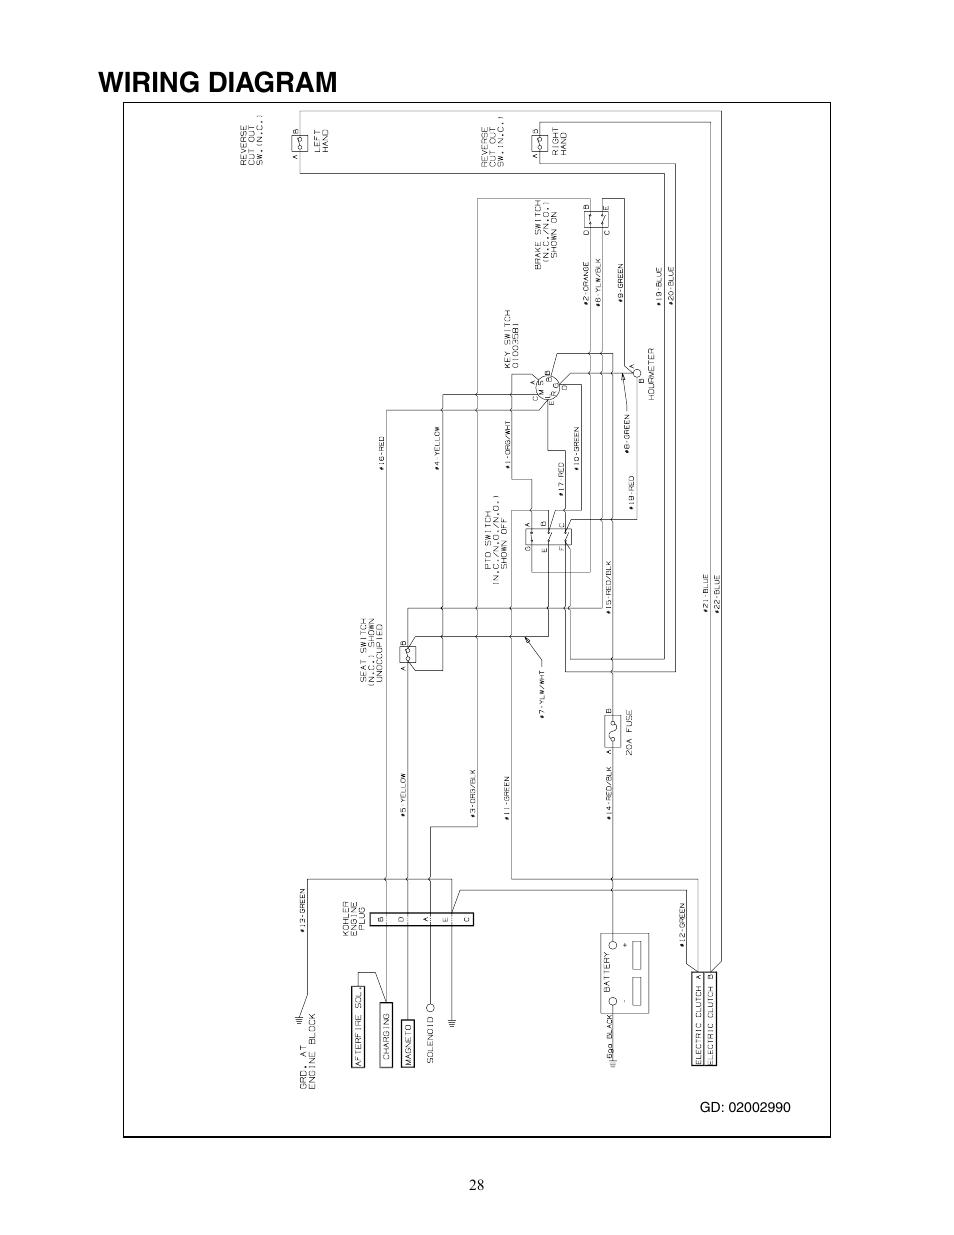 Cub Cadet Z Force 44 Wiring Diagram Manual Guide 1641 20hp User Page 28 32 Rh Manualsdir Com